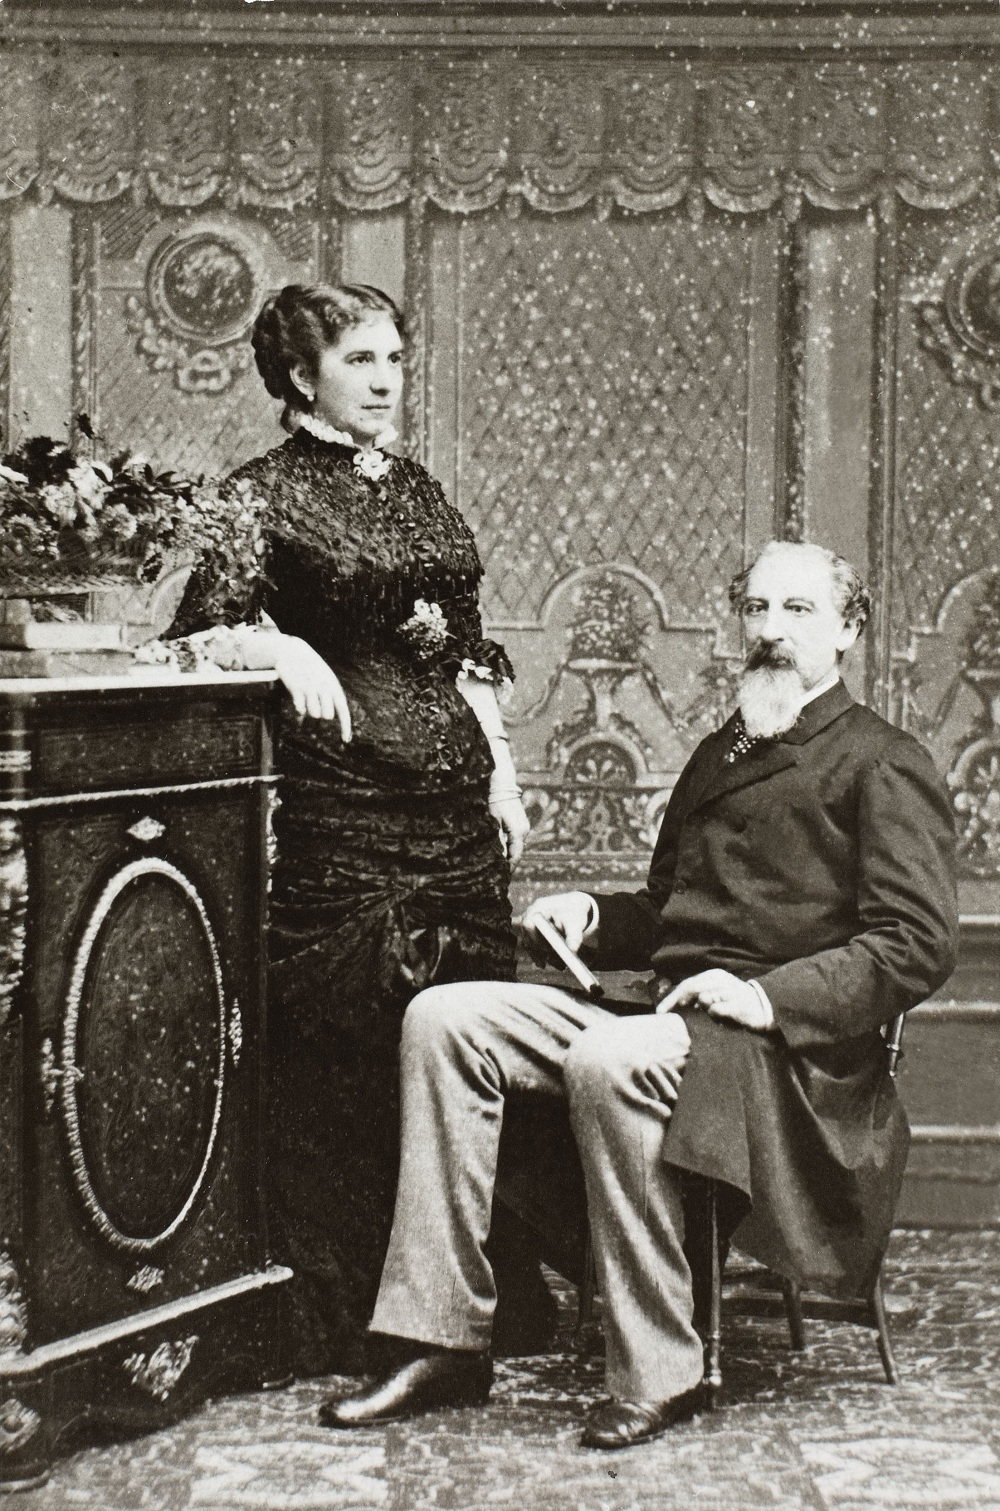 'Os Criadores da Pena – D. Fernando II e a Condessa d'Edla